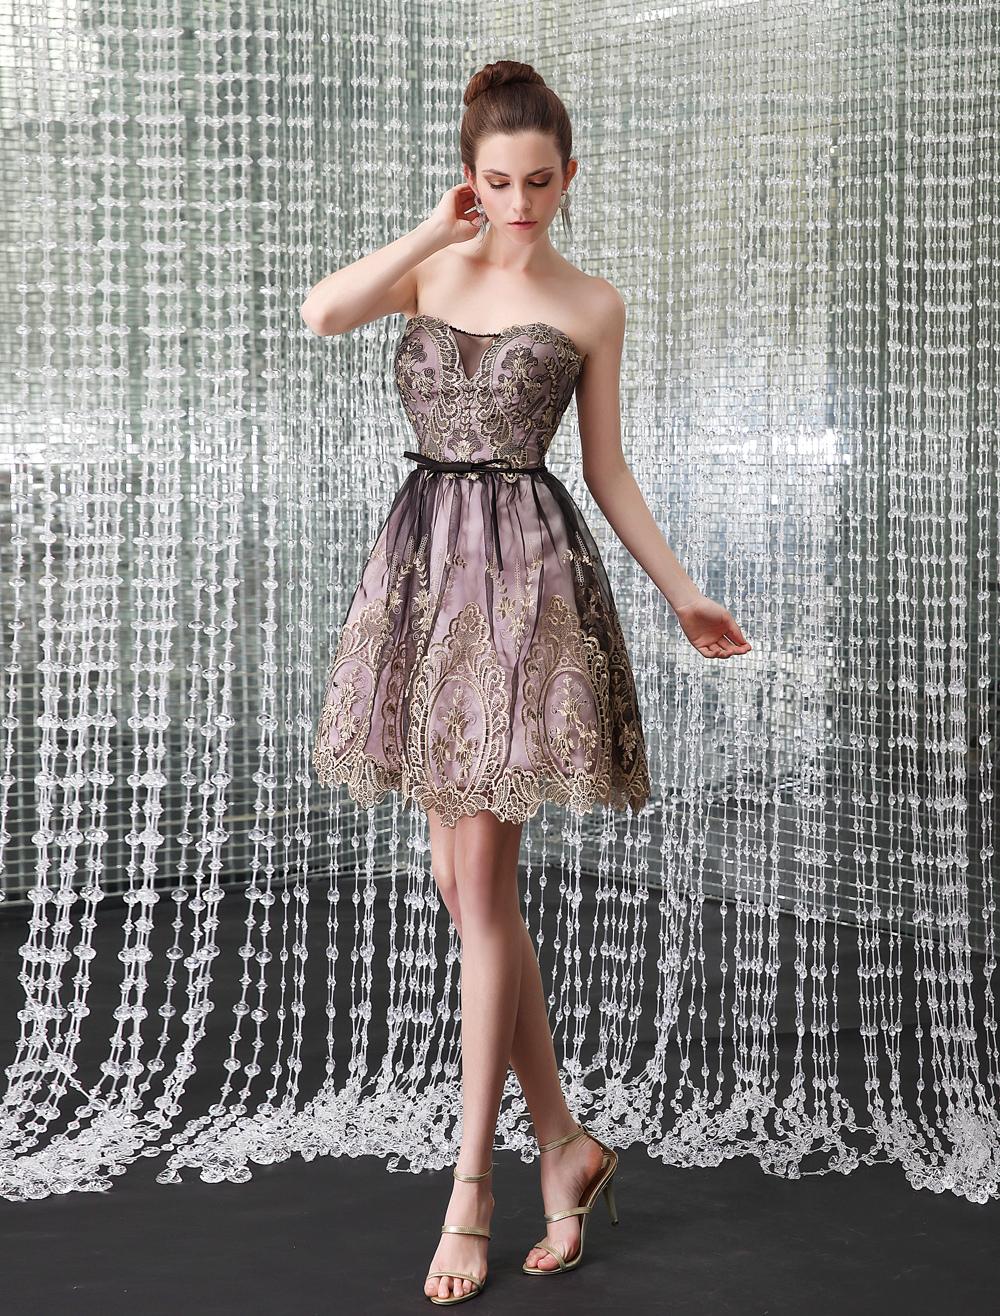 Chic Strapless Lace Short Women's Cocktail Dress Milanoo